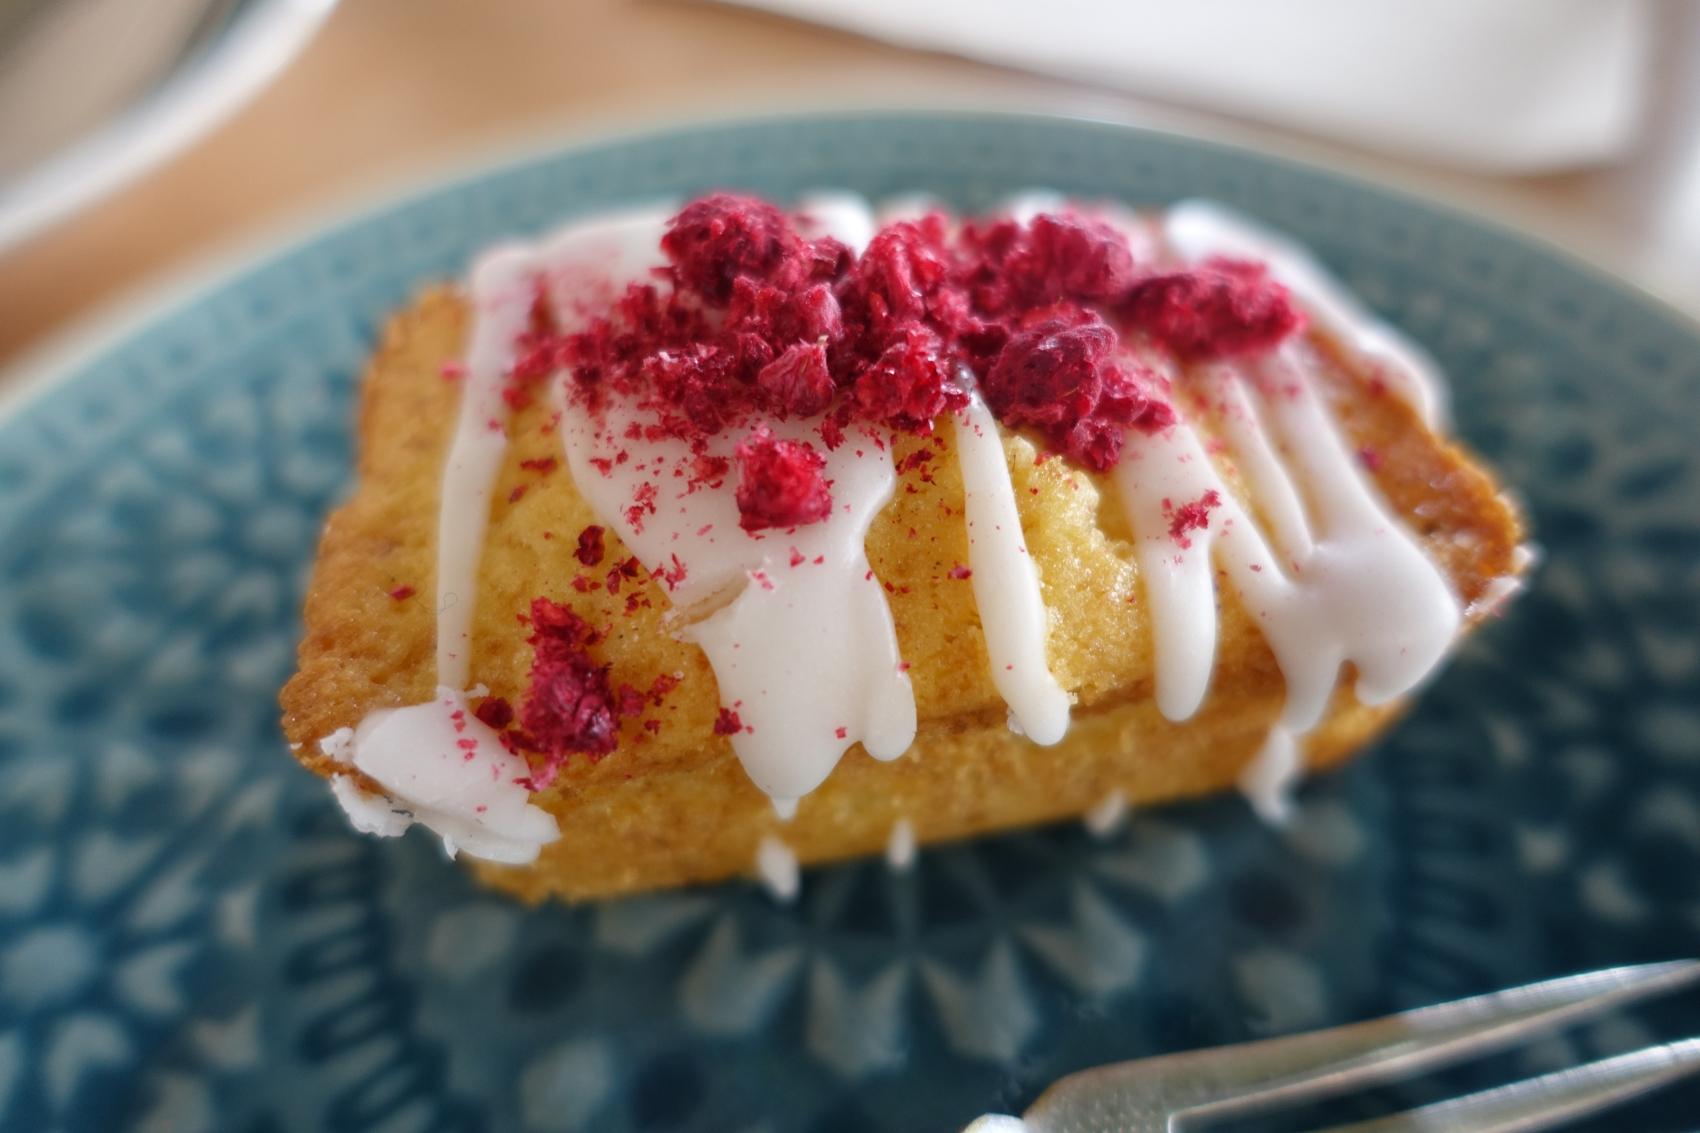 Mini-cake sans gluten citron-framboise (Crédit photo: Xuxu/Almamat(t)ers)